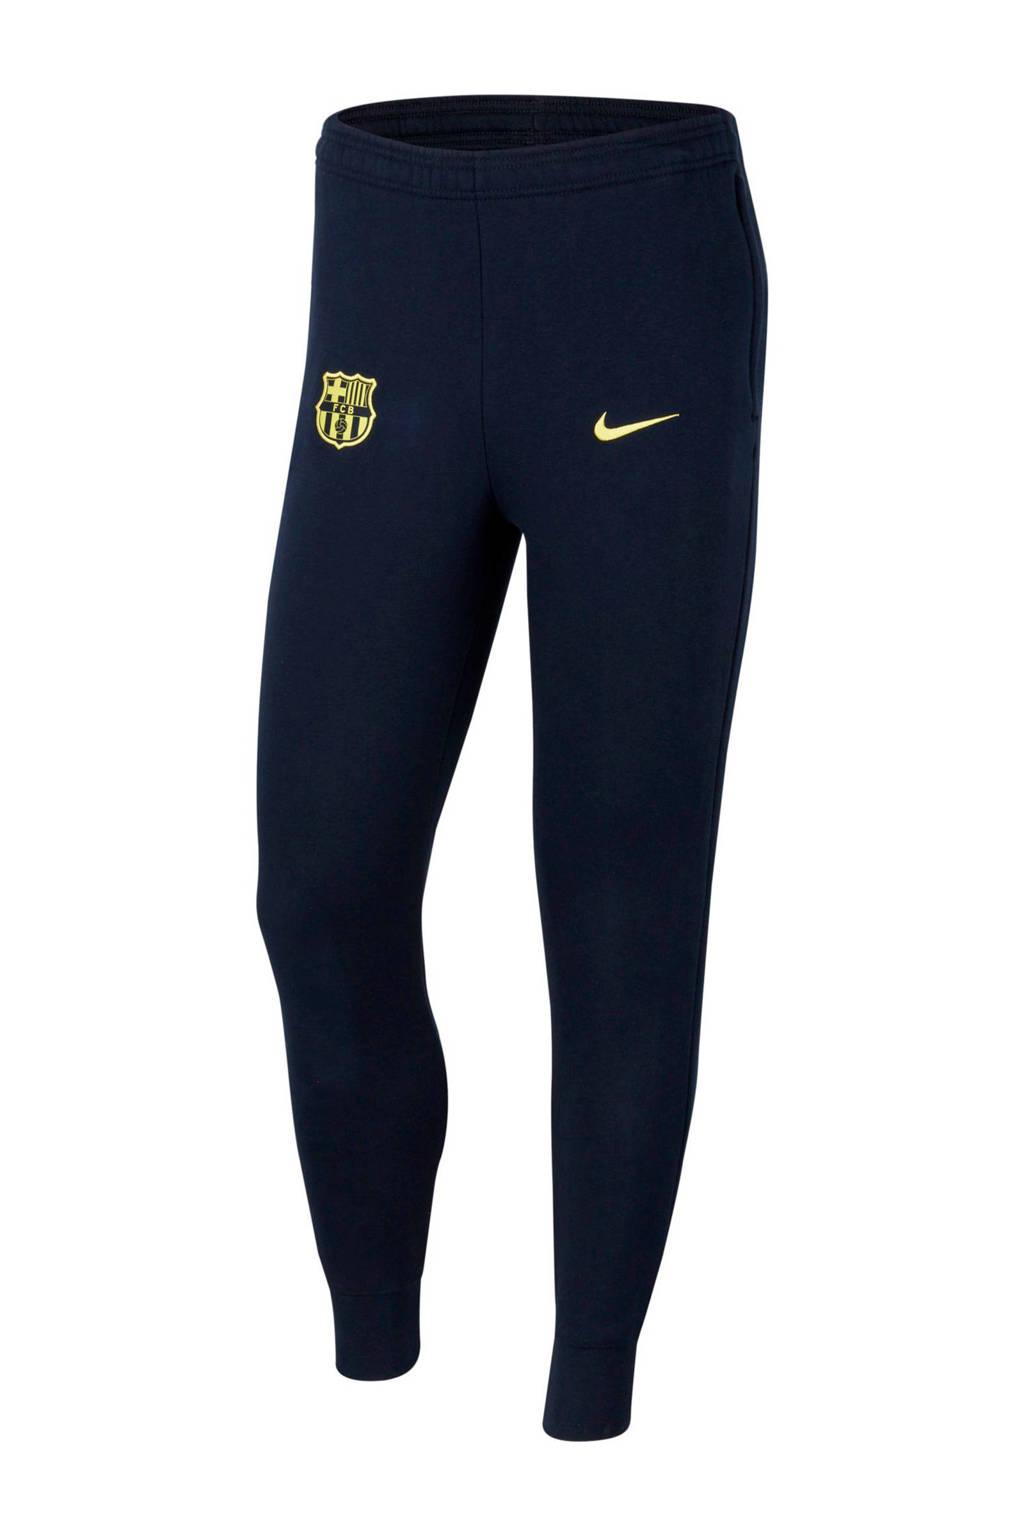 Nike Senior FC Barcelona voetbalbroek donkerblauw, Donkerblauw